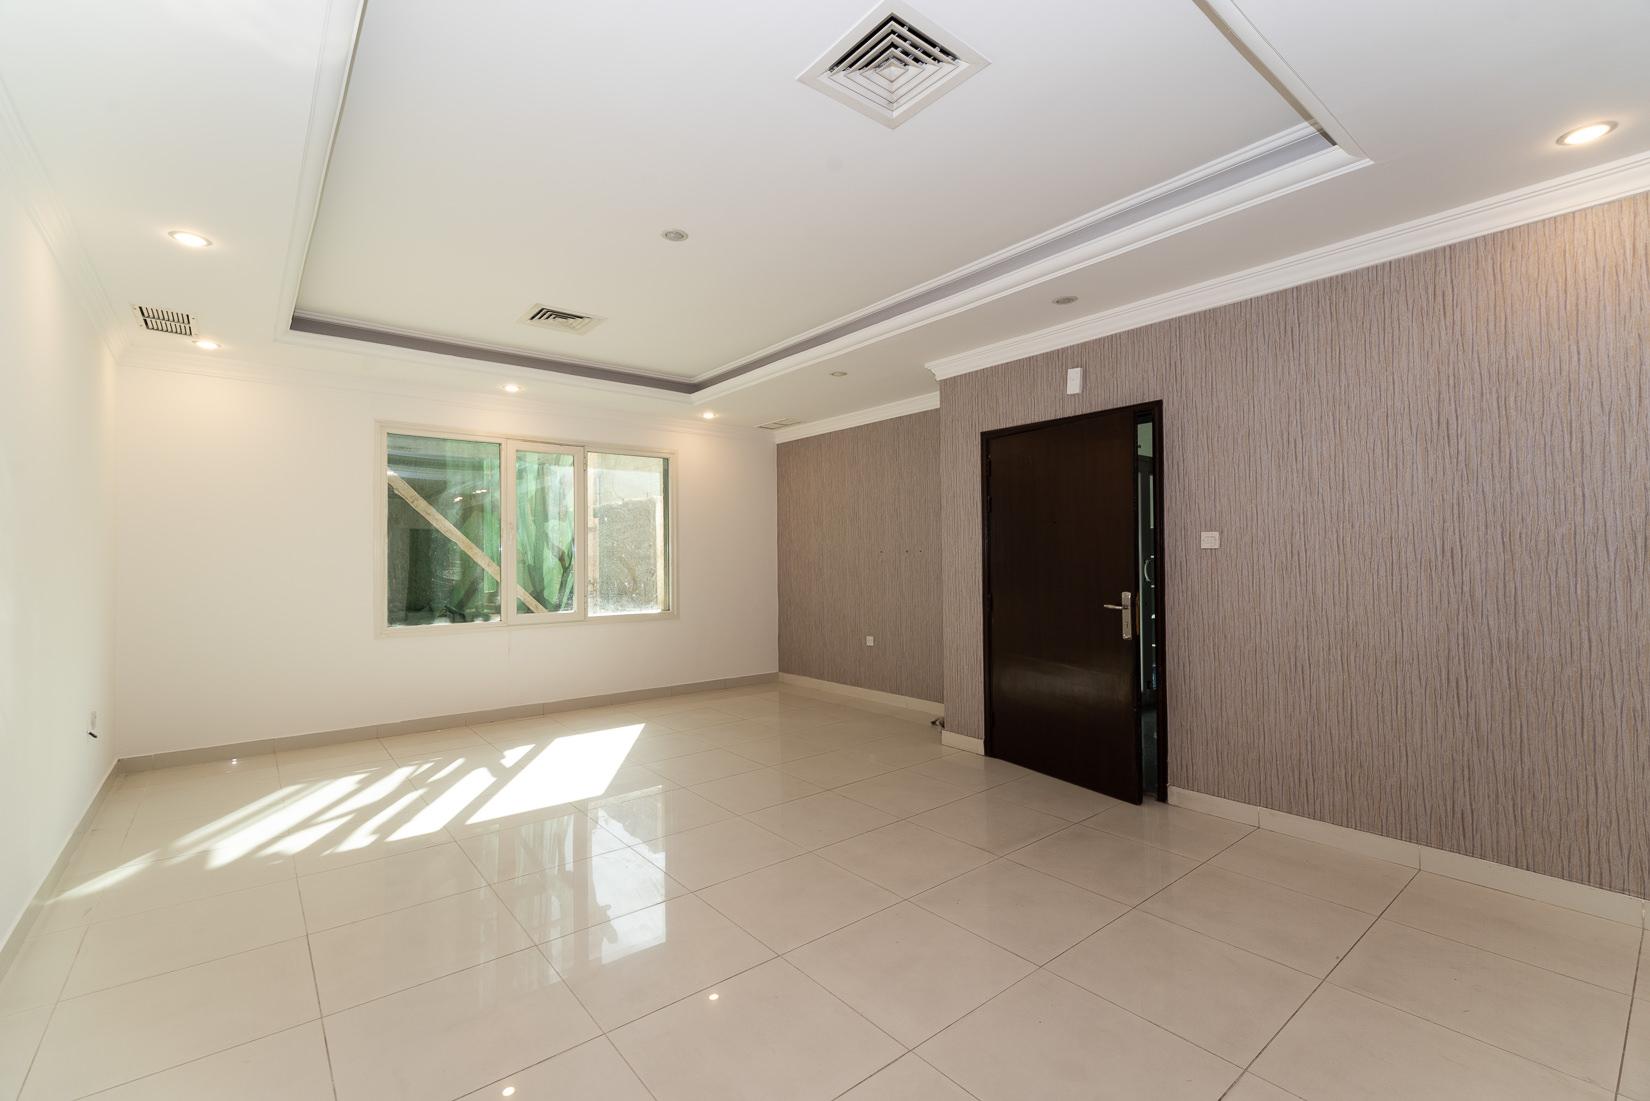 Rumaithiya – older, four bedroom apartment